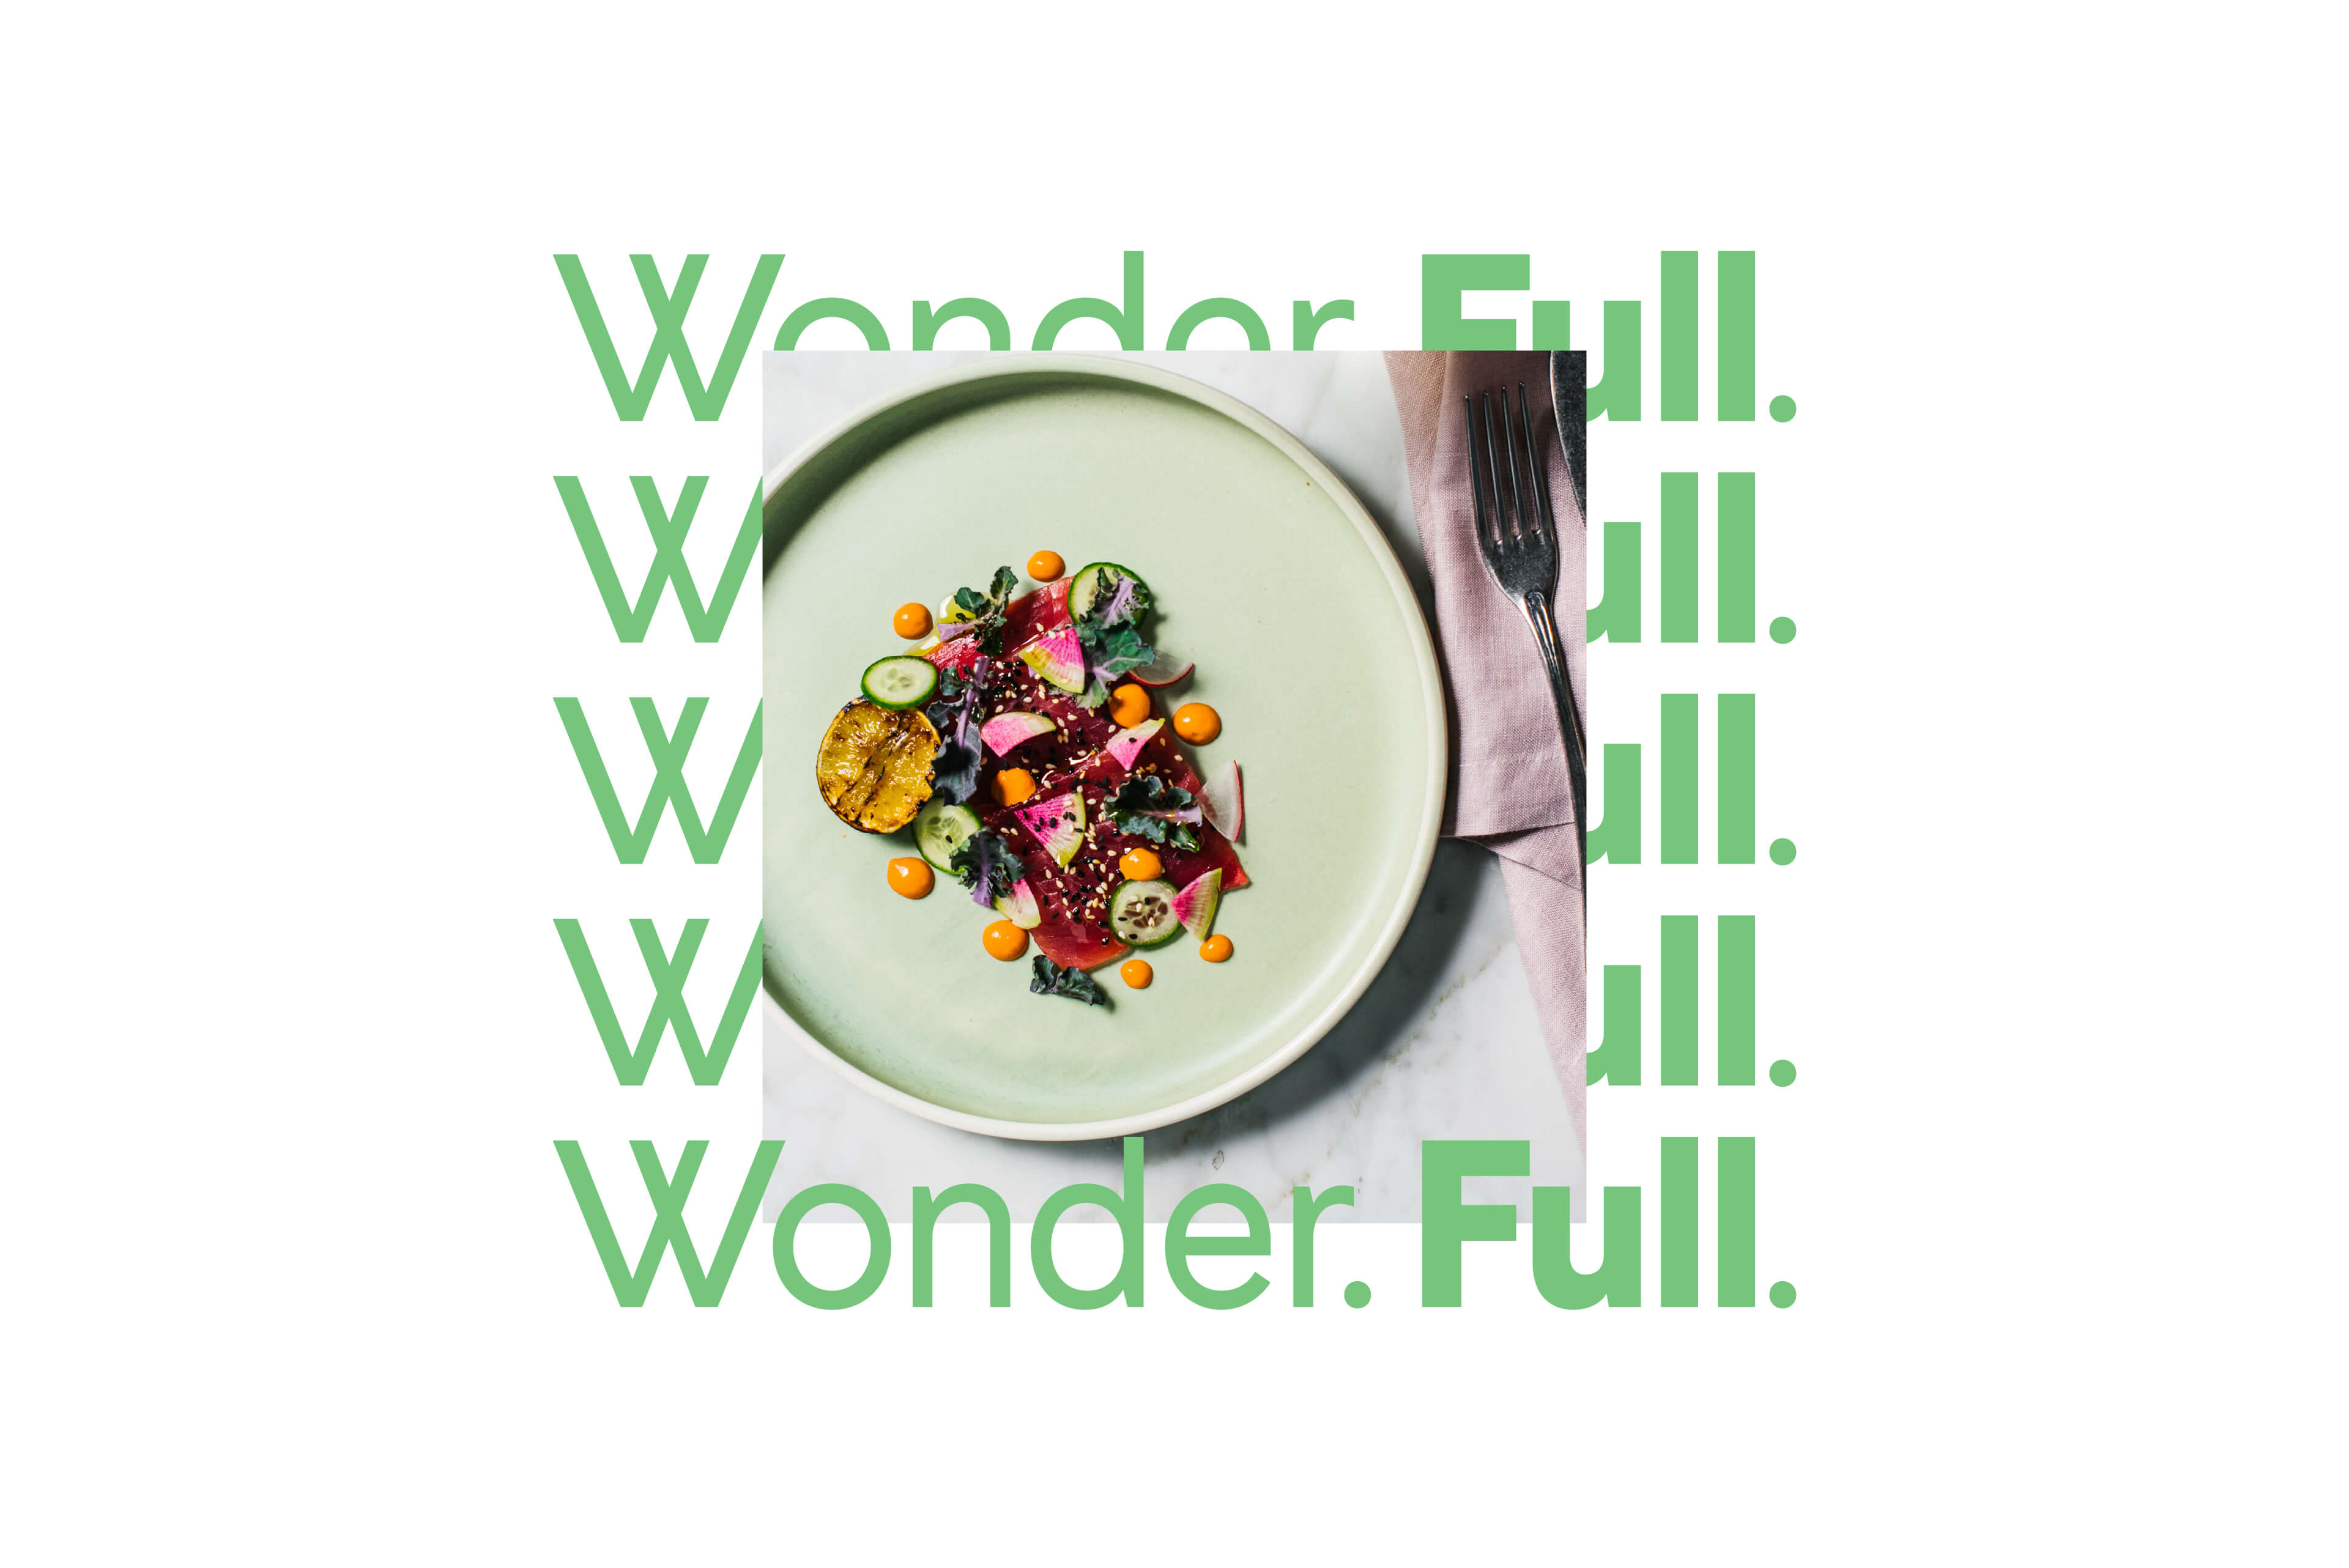 Ovolo Hotels Brand Refresh - Wonder. Full. Typographic Framework & Photography 4